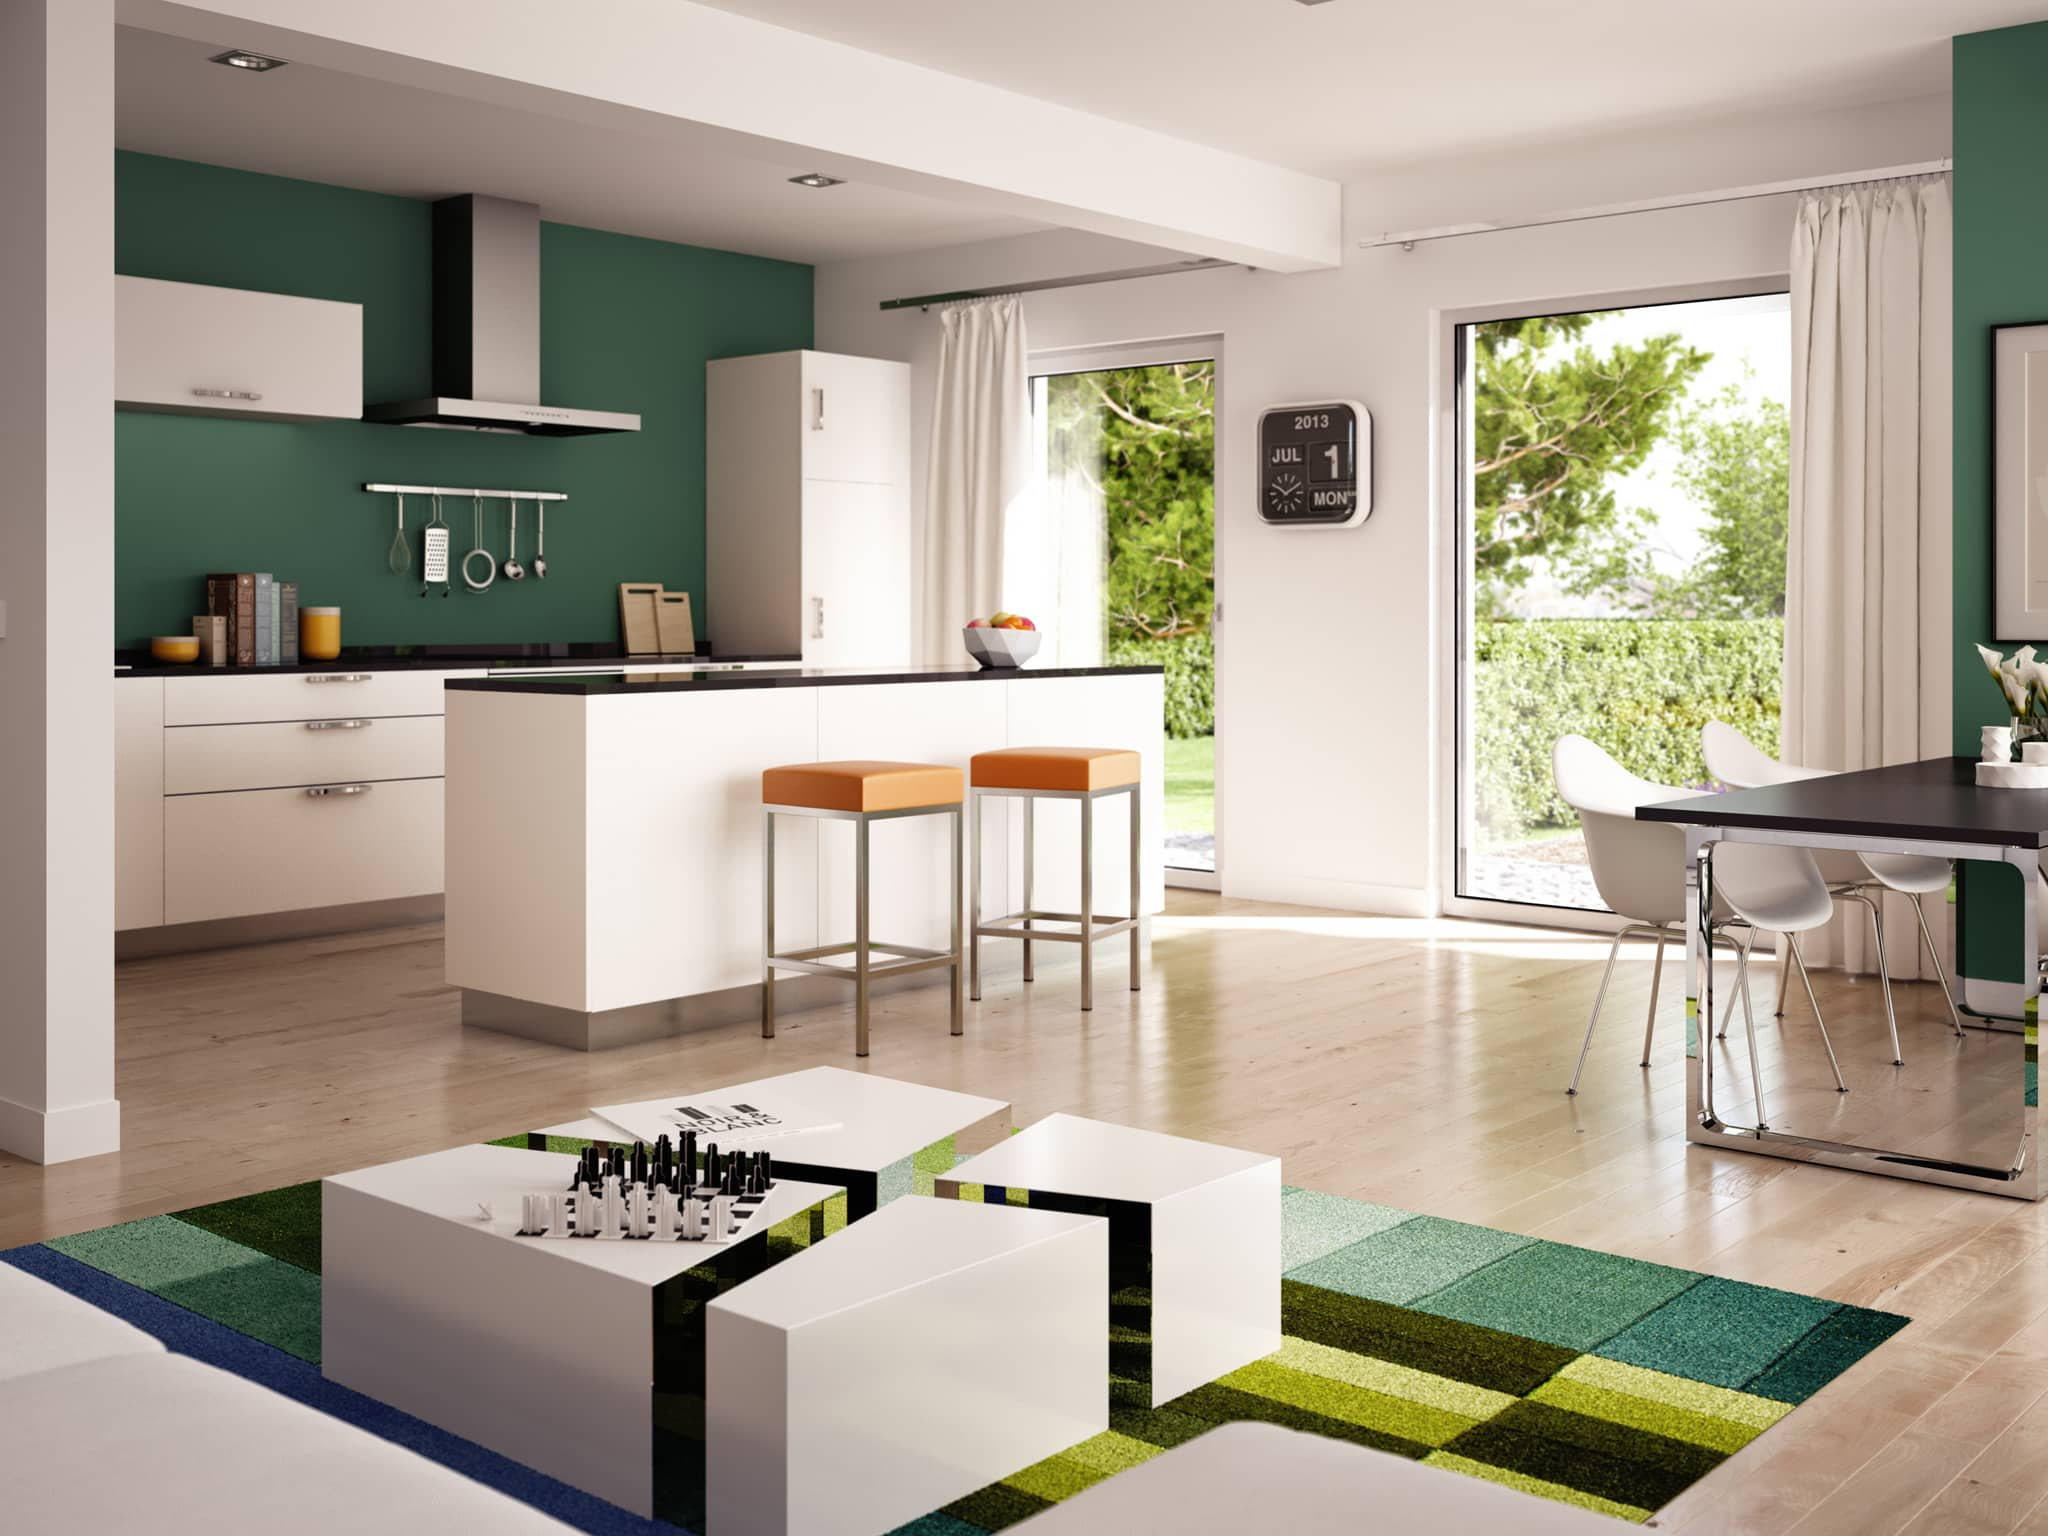 Wohnküche Ideen - Inneneinrichtung Fertighaus SOLUTION 204 V8 von Living Haus - HausbauDirekt.de